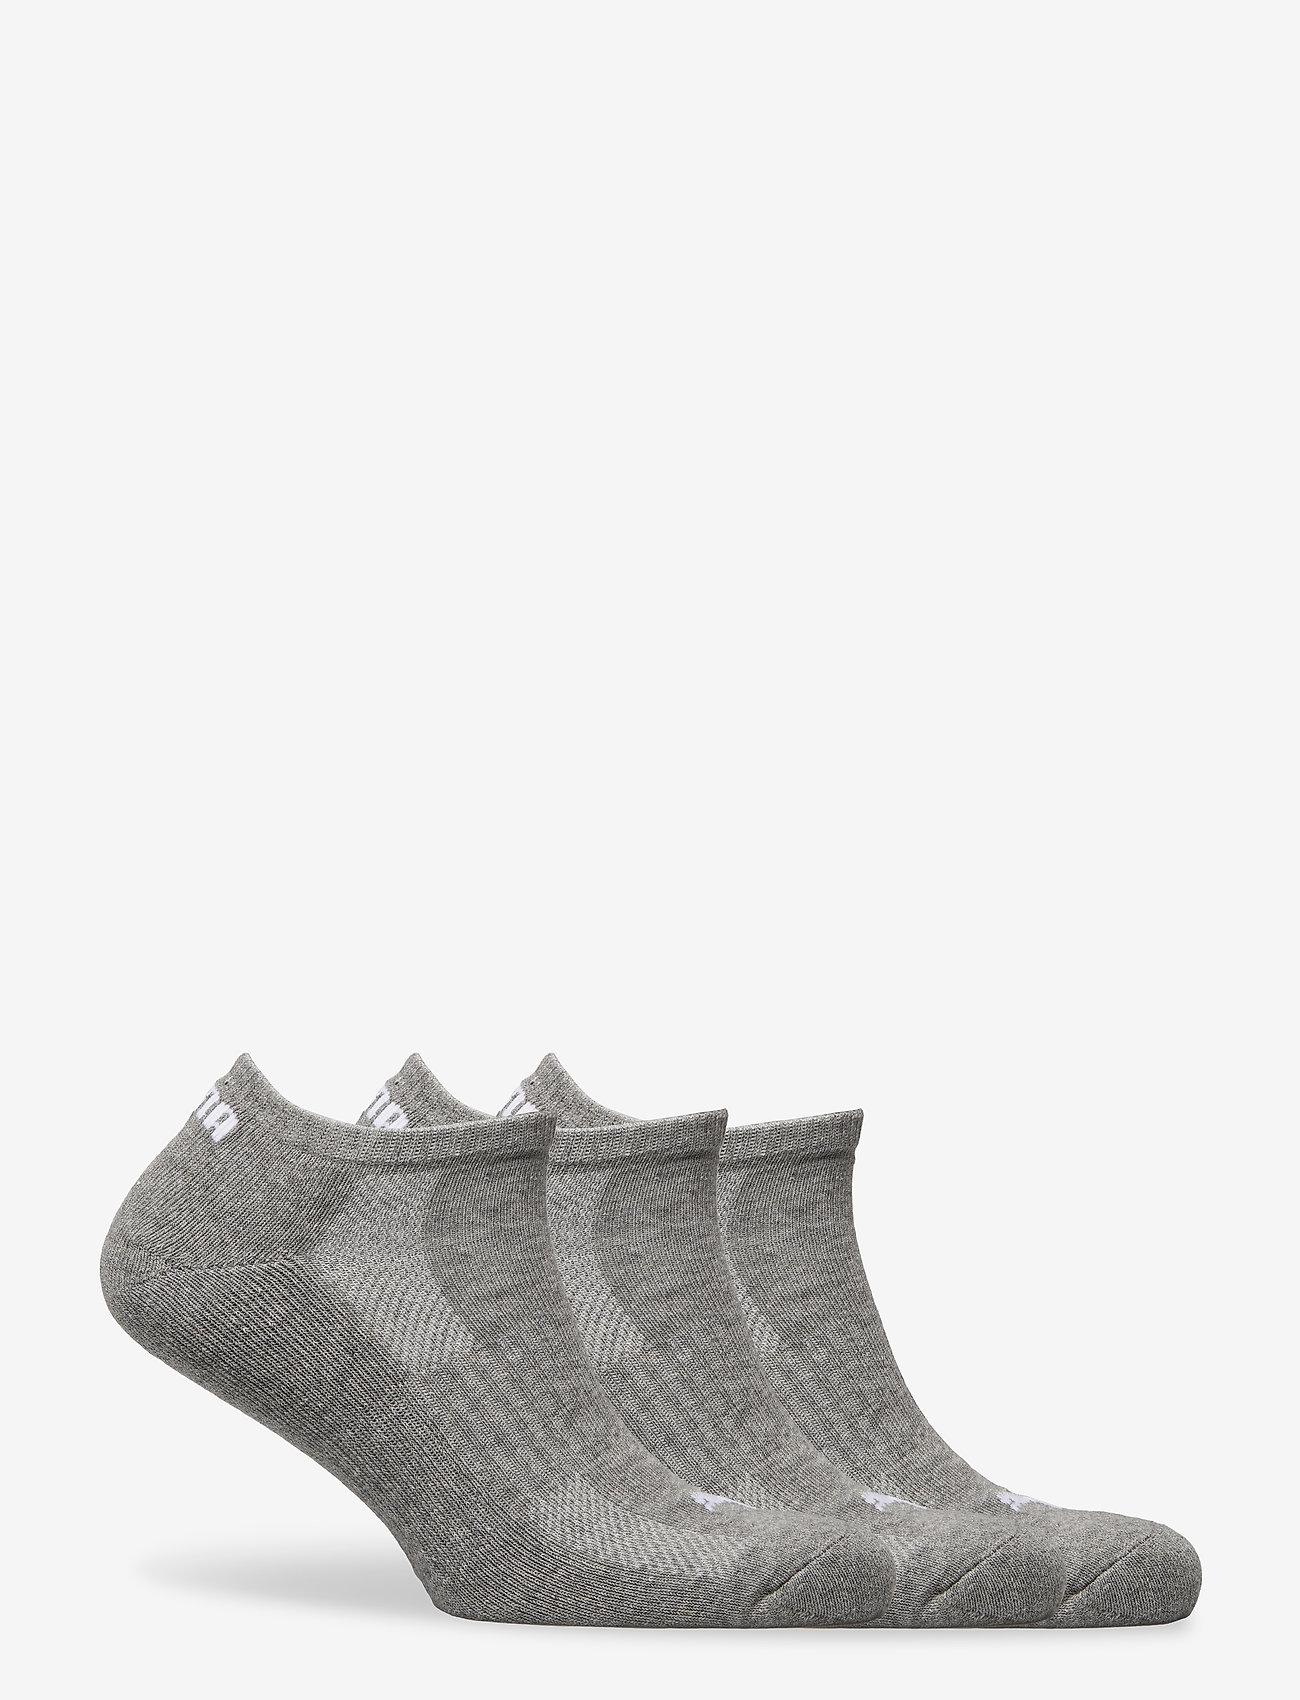 PUMA - PUMA CUSHIONED SNEAKER 3P UNISEX - ankelstrumpor - middle grey melange - 1